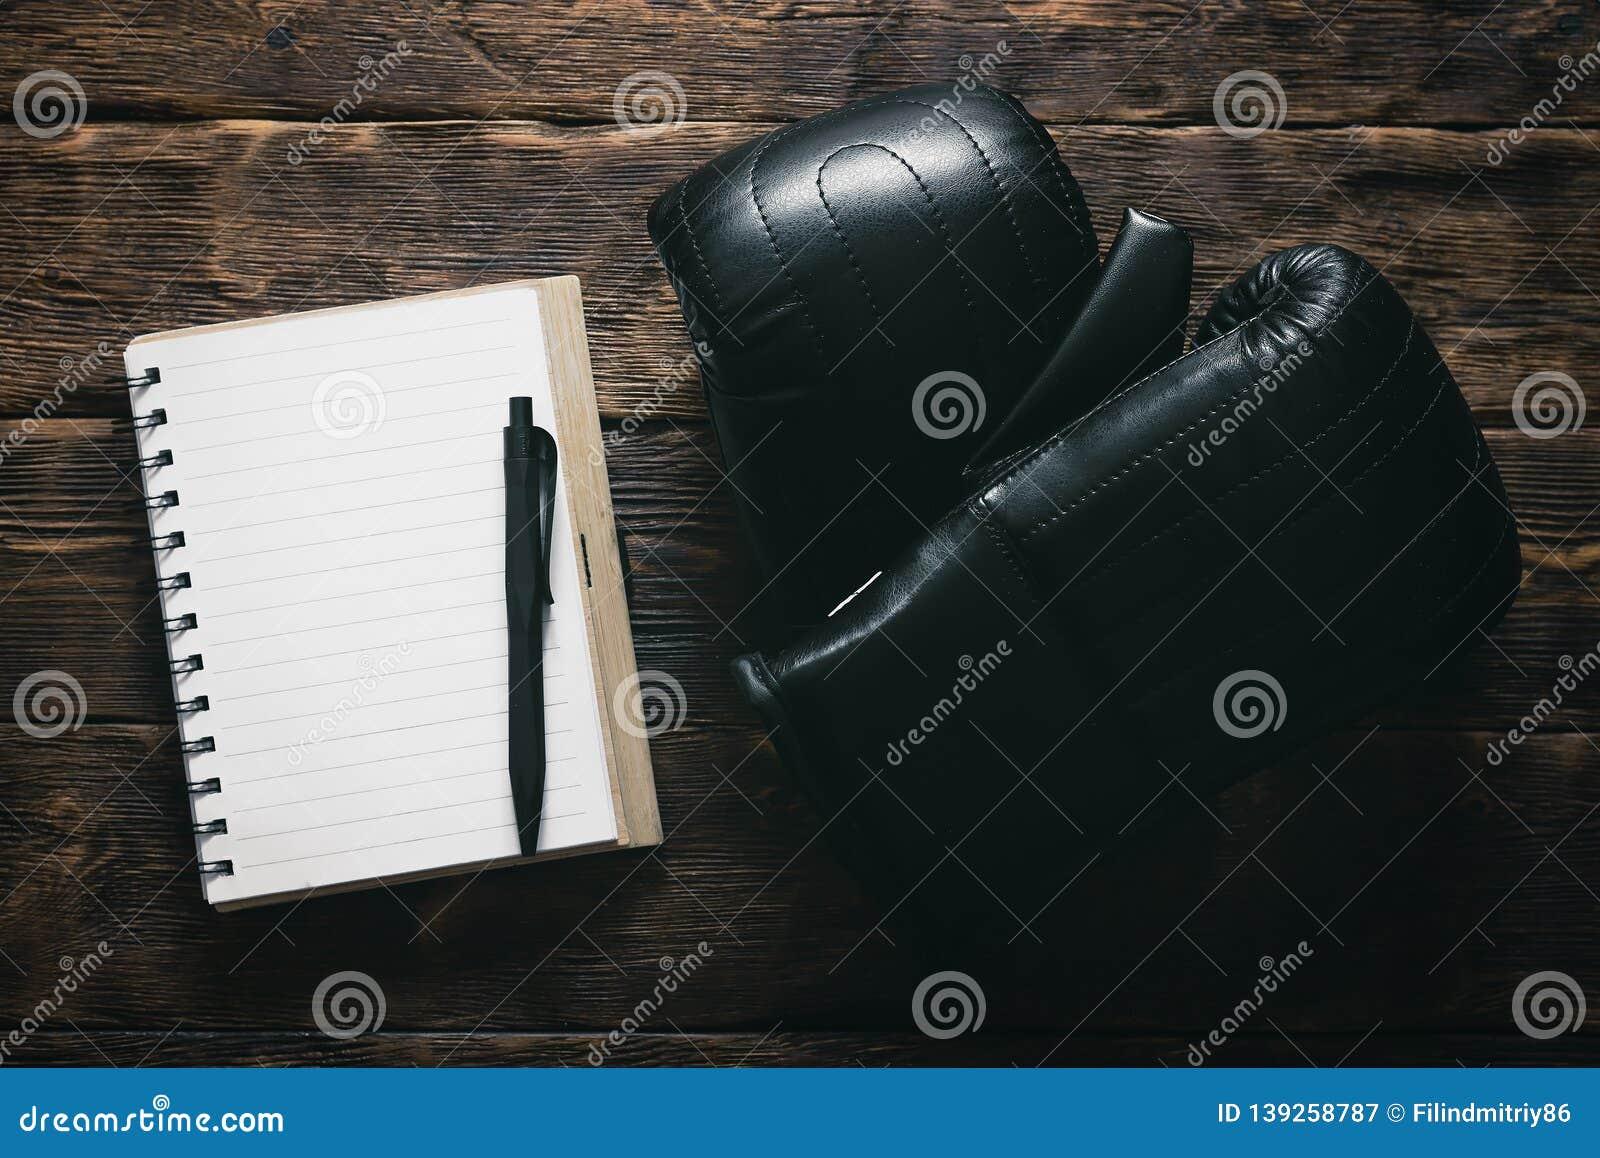 Boxing Gloves And Training Program Notepad  Stock Image